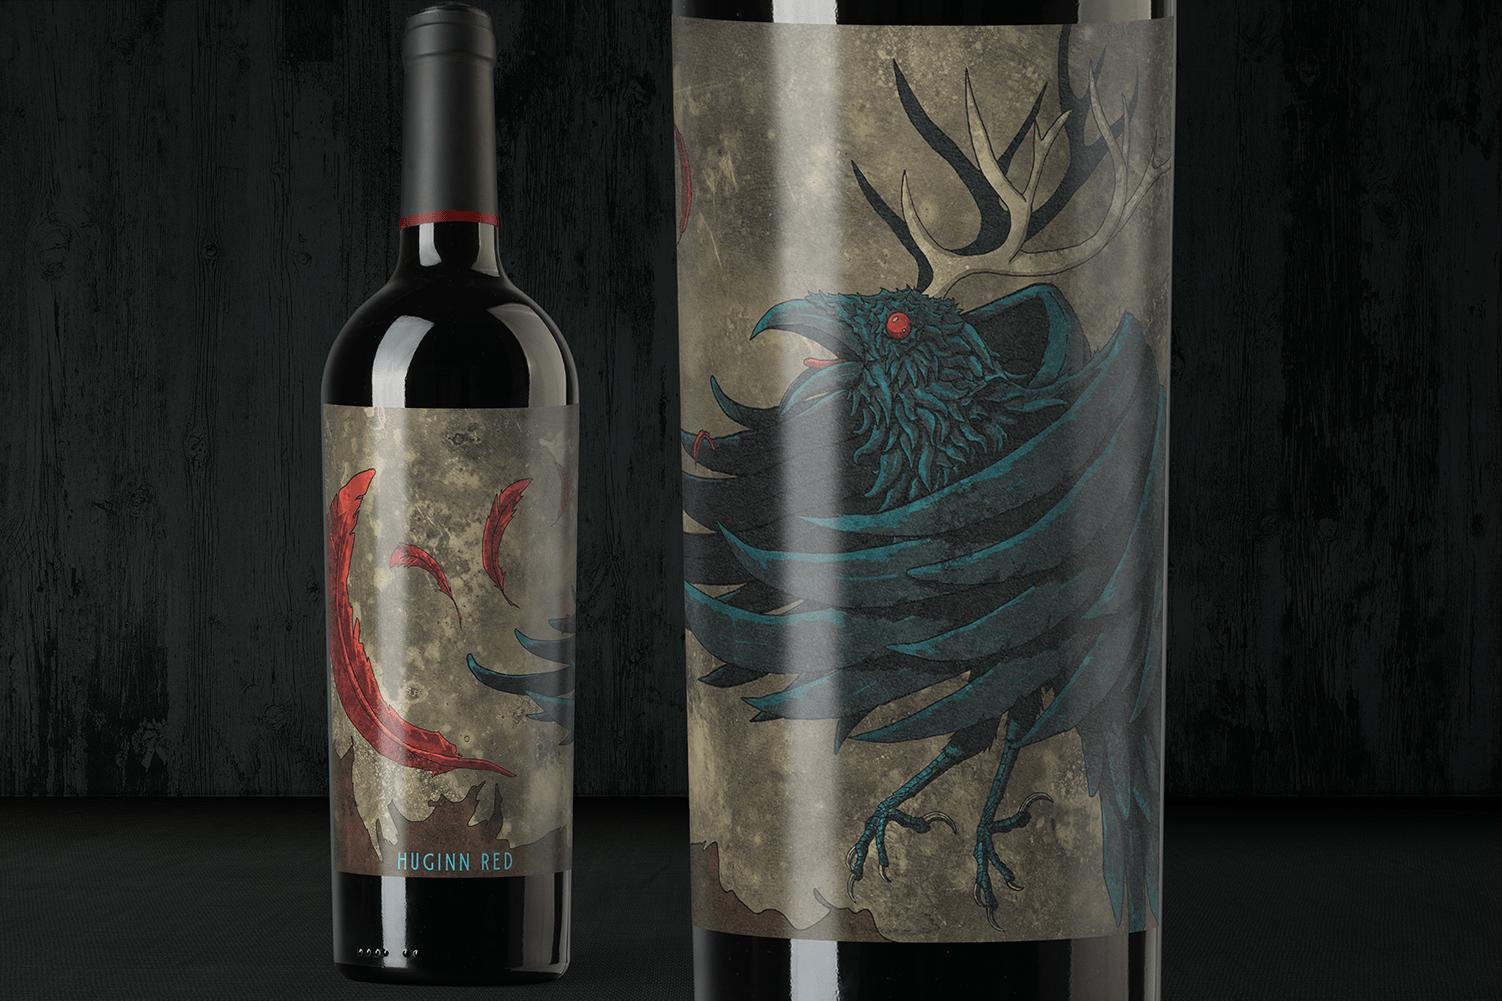 Huginn Red Wine-front-packaging-scene_mockup 2.png